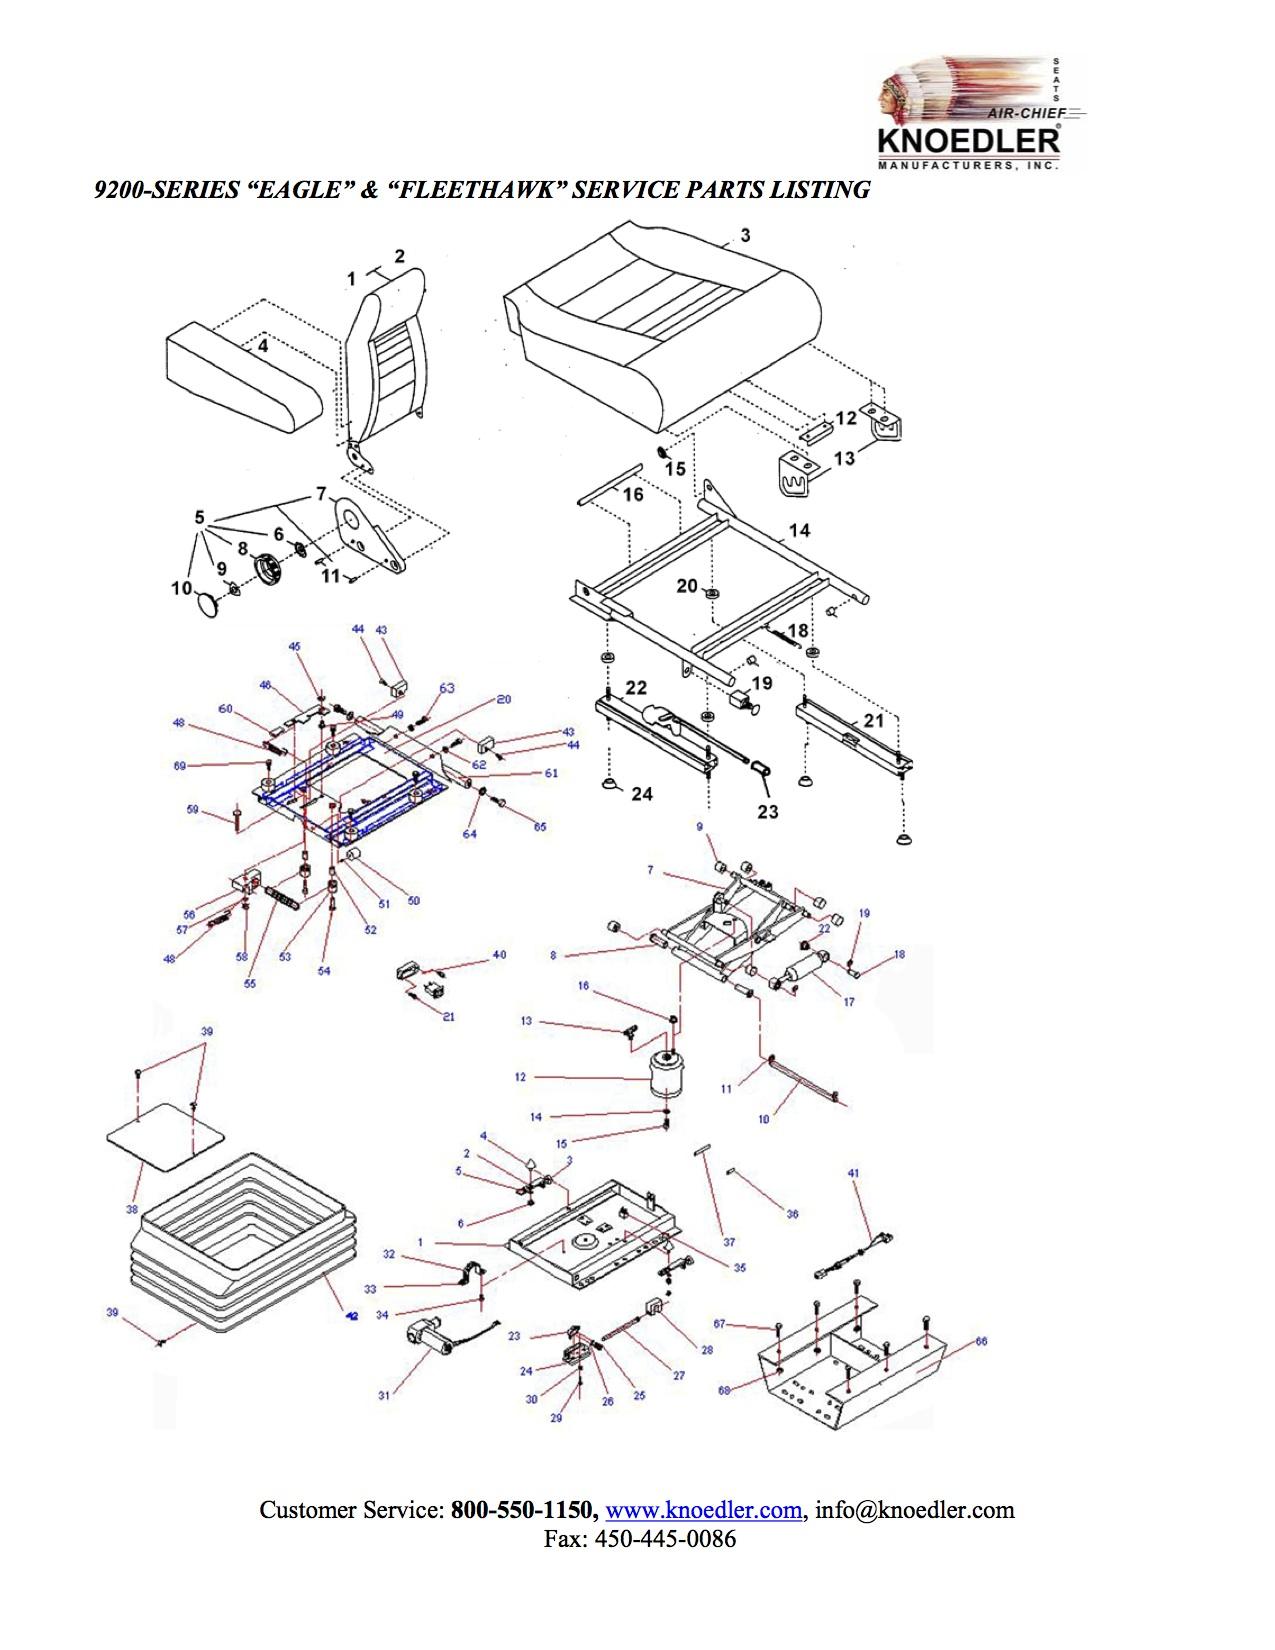 92-series-parts-pic.jpg